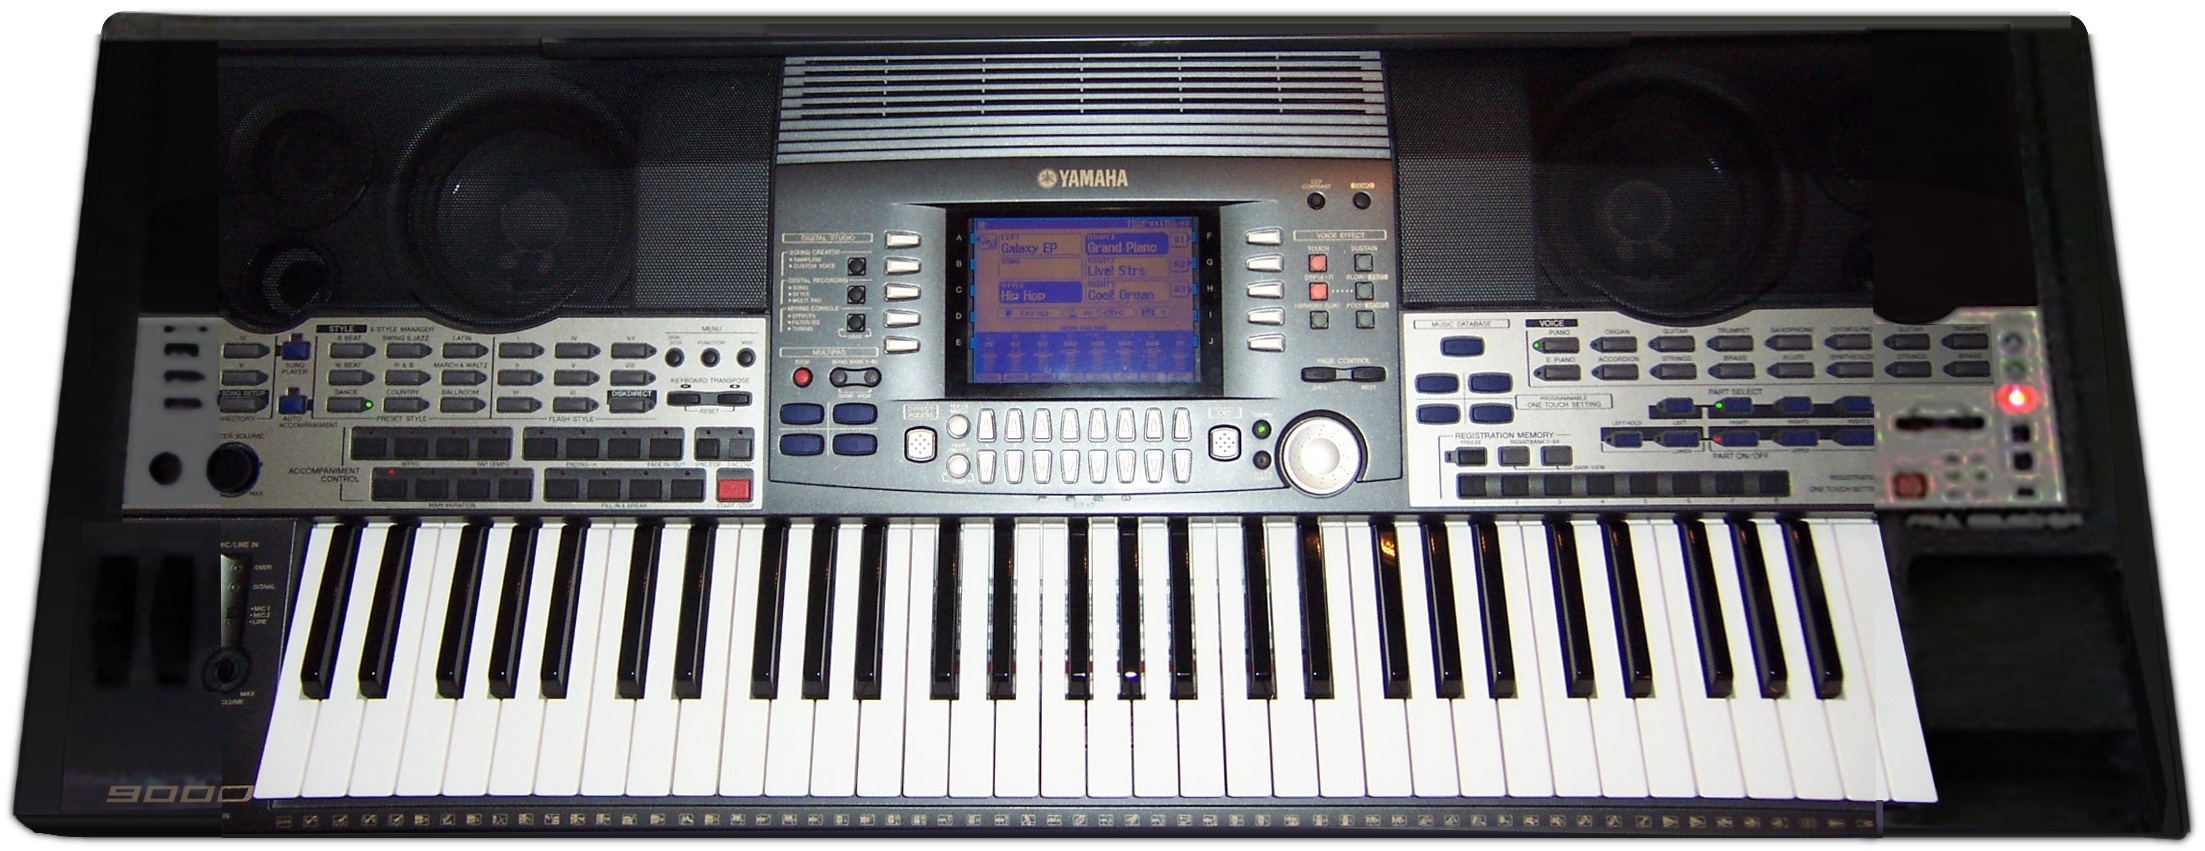 Yamaha psr 9000 image 317079 audiofanzine for Yamaha a3000 keyboard